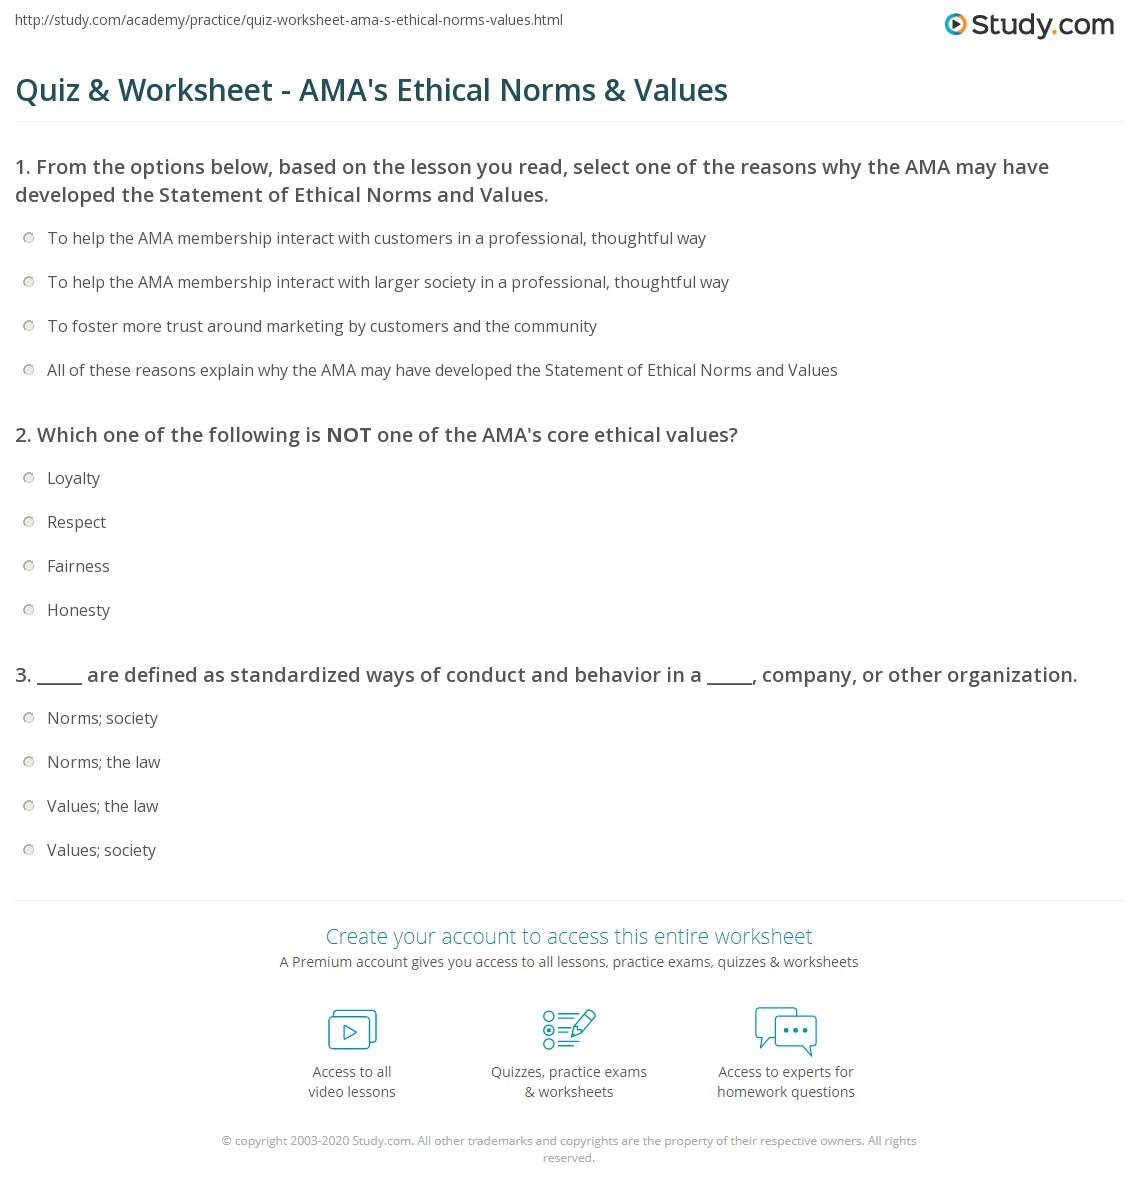 worksheet Core Values Worksheet quiz worksheet amas ethical norms values study com print the ama statement of worksheet